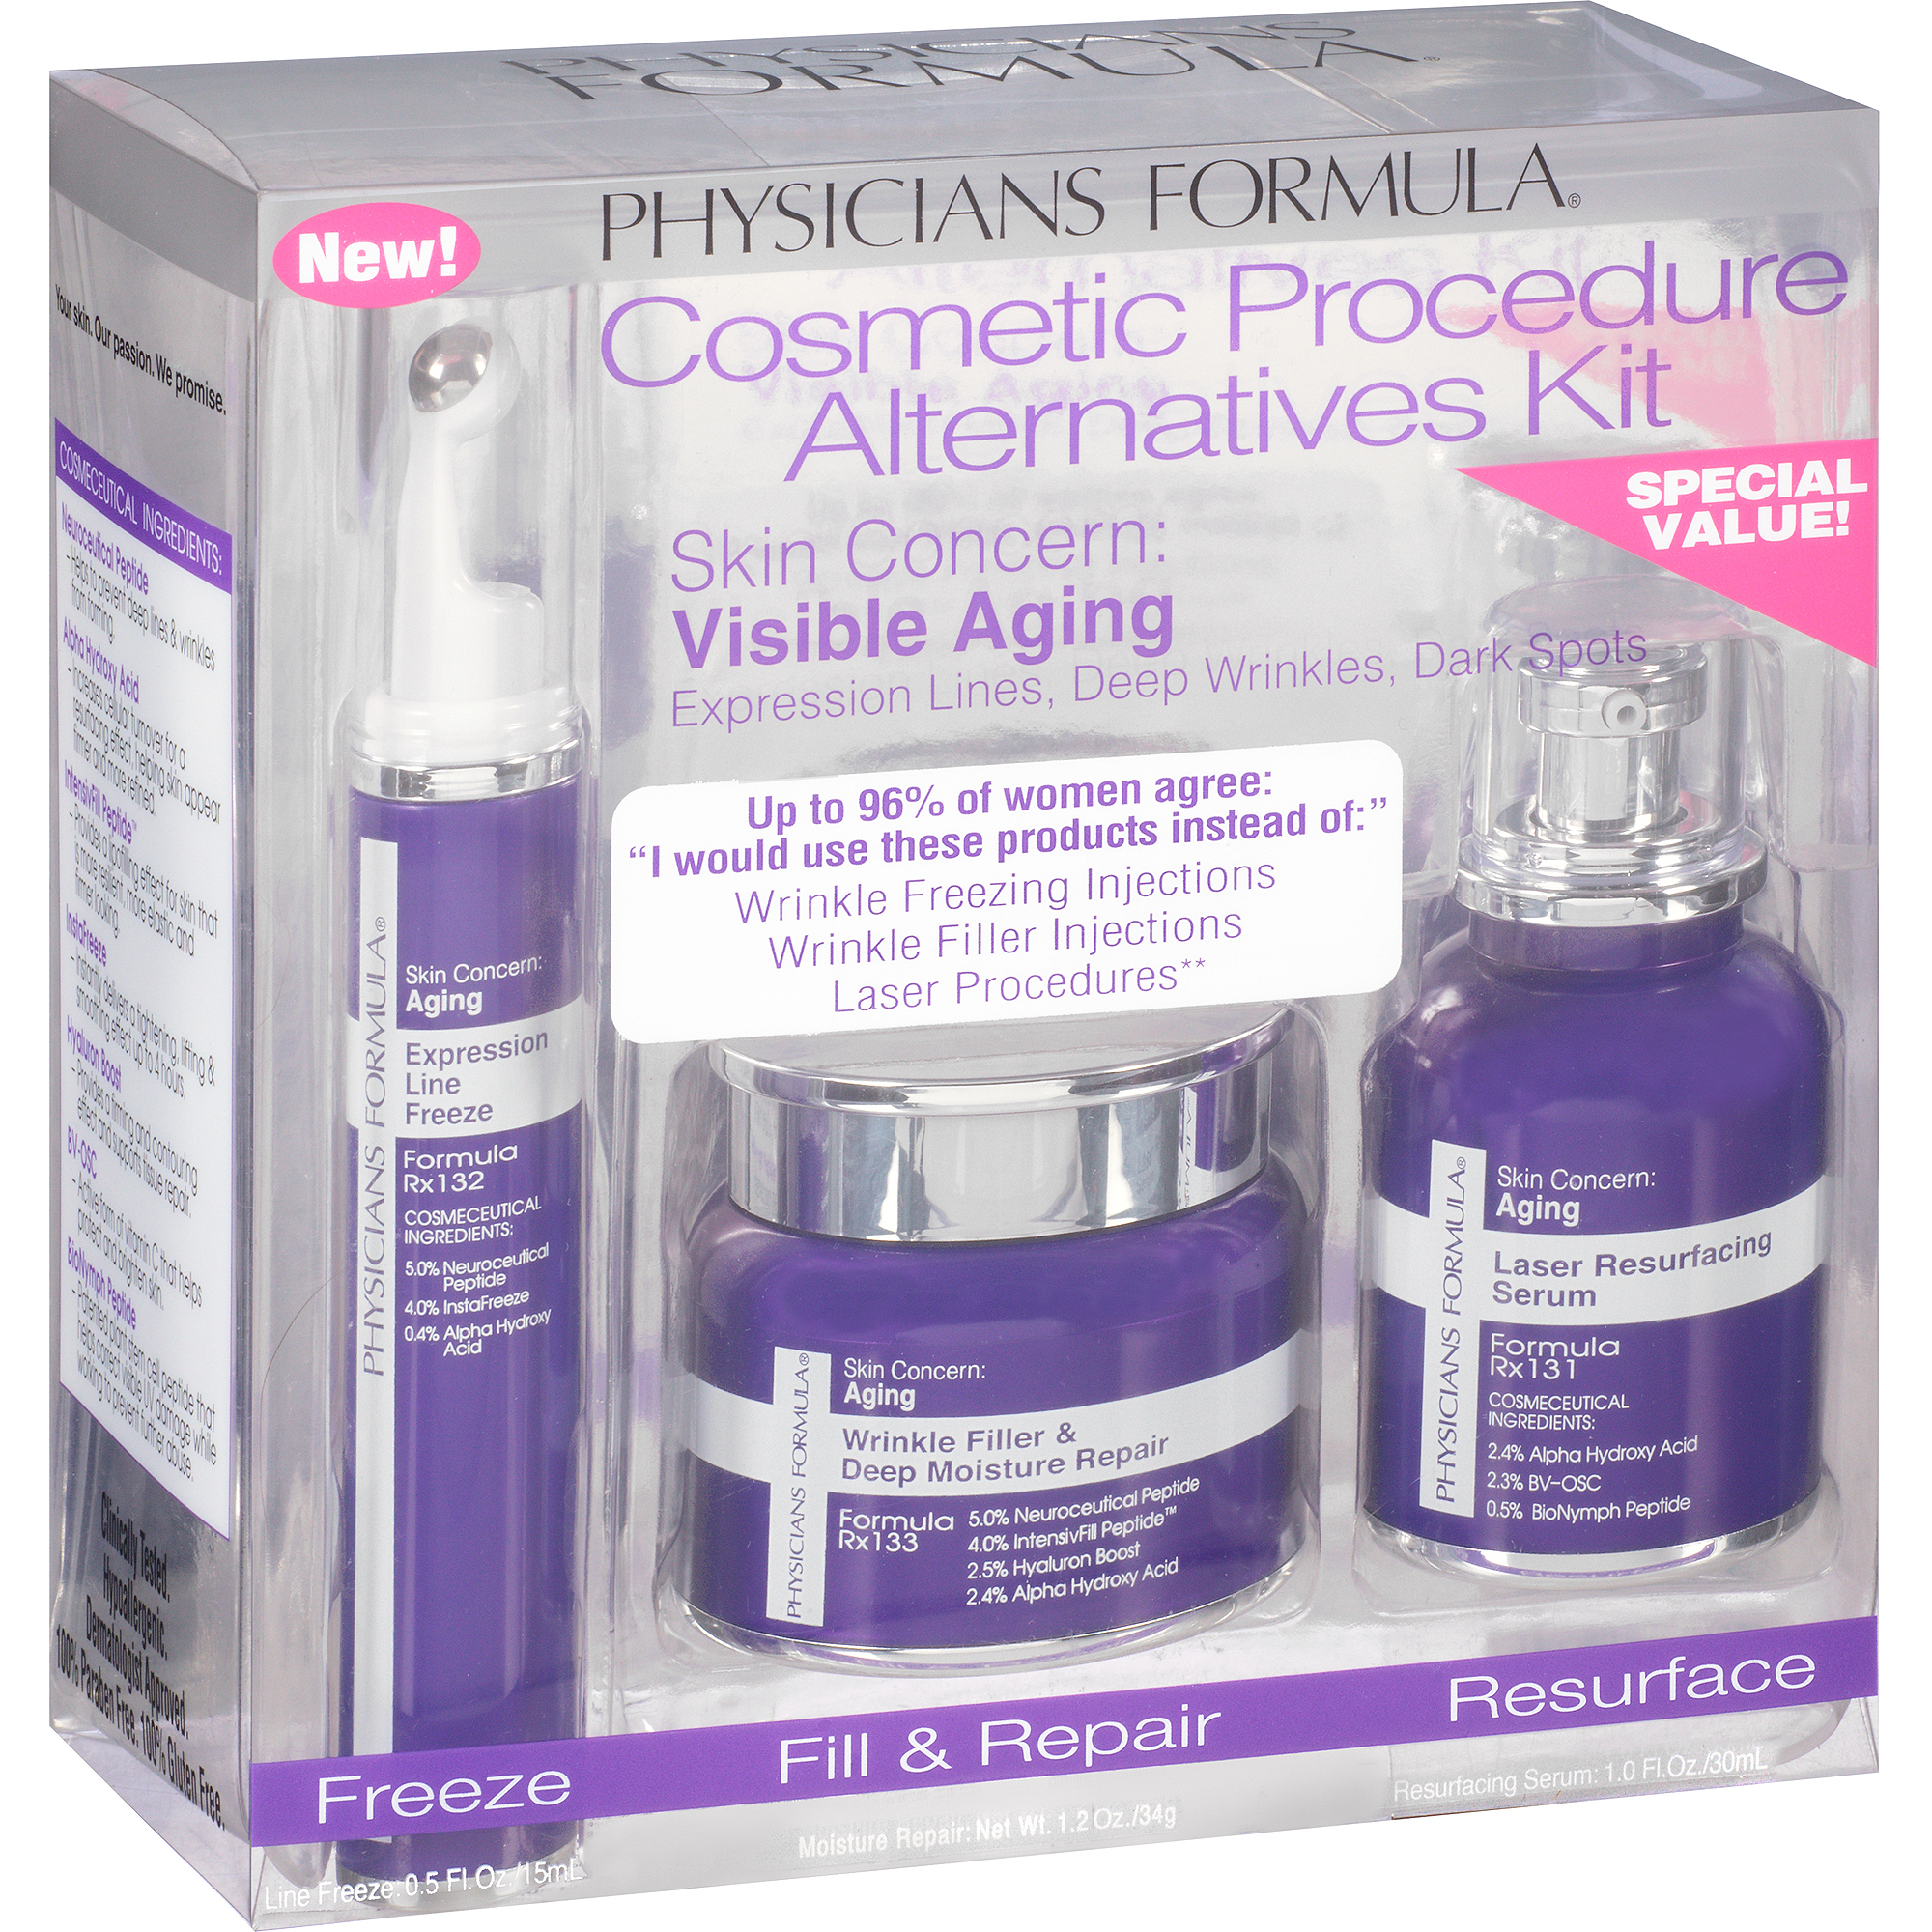 Physicians Formula Cosmetic Procedure Alternatives Kit, 3 pc